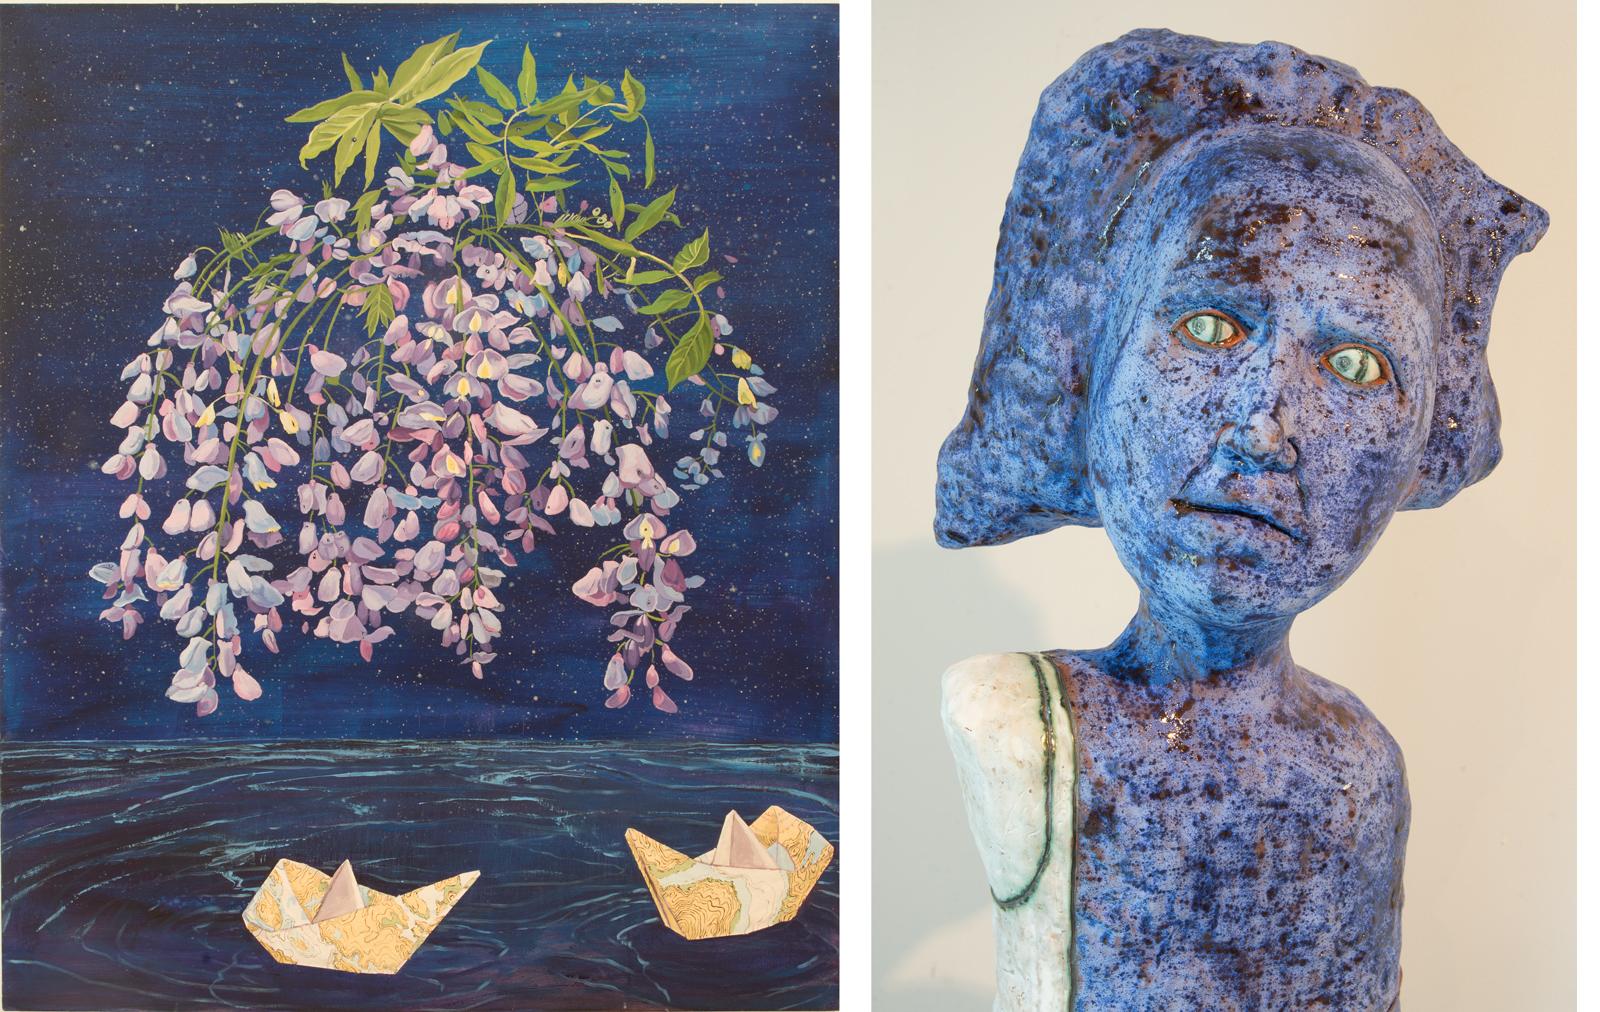 Jeffrey Whittle's Celestial Bouquet and Crisha Yantis' Naively Skeptical(Detail)